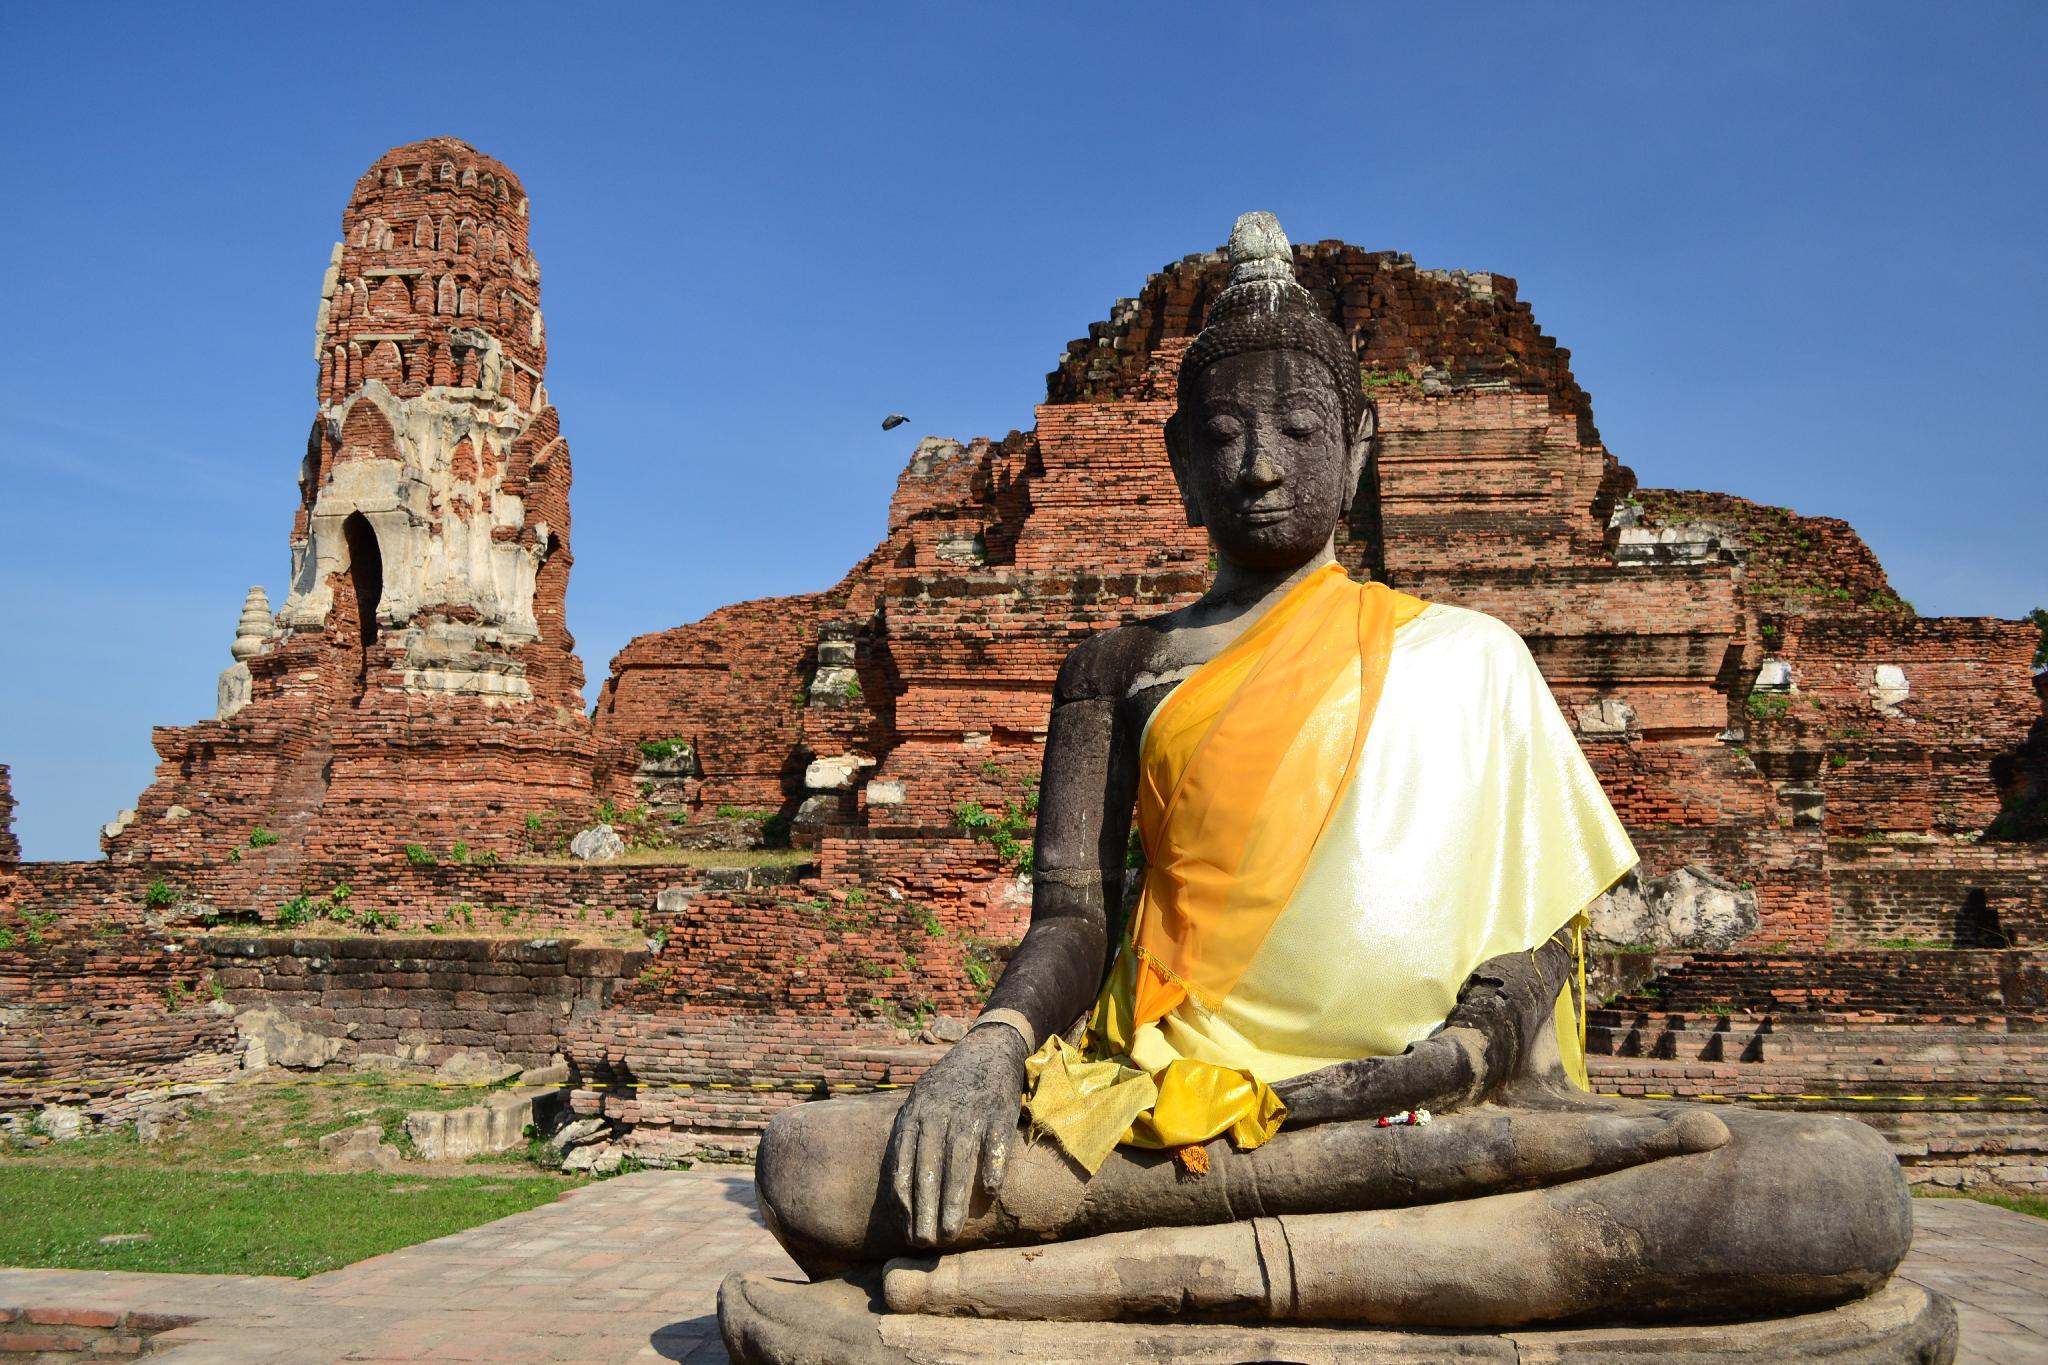 Room31, Phra Nakhon Si Ayutthaya